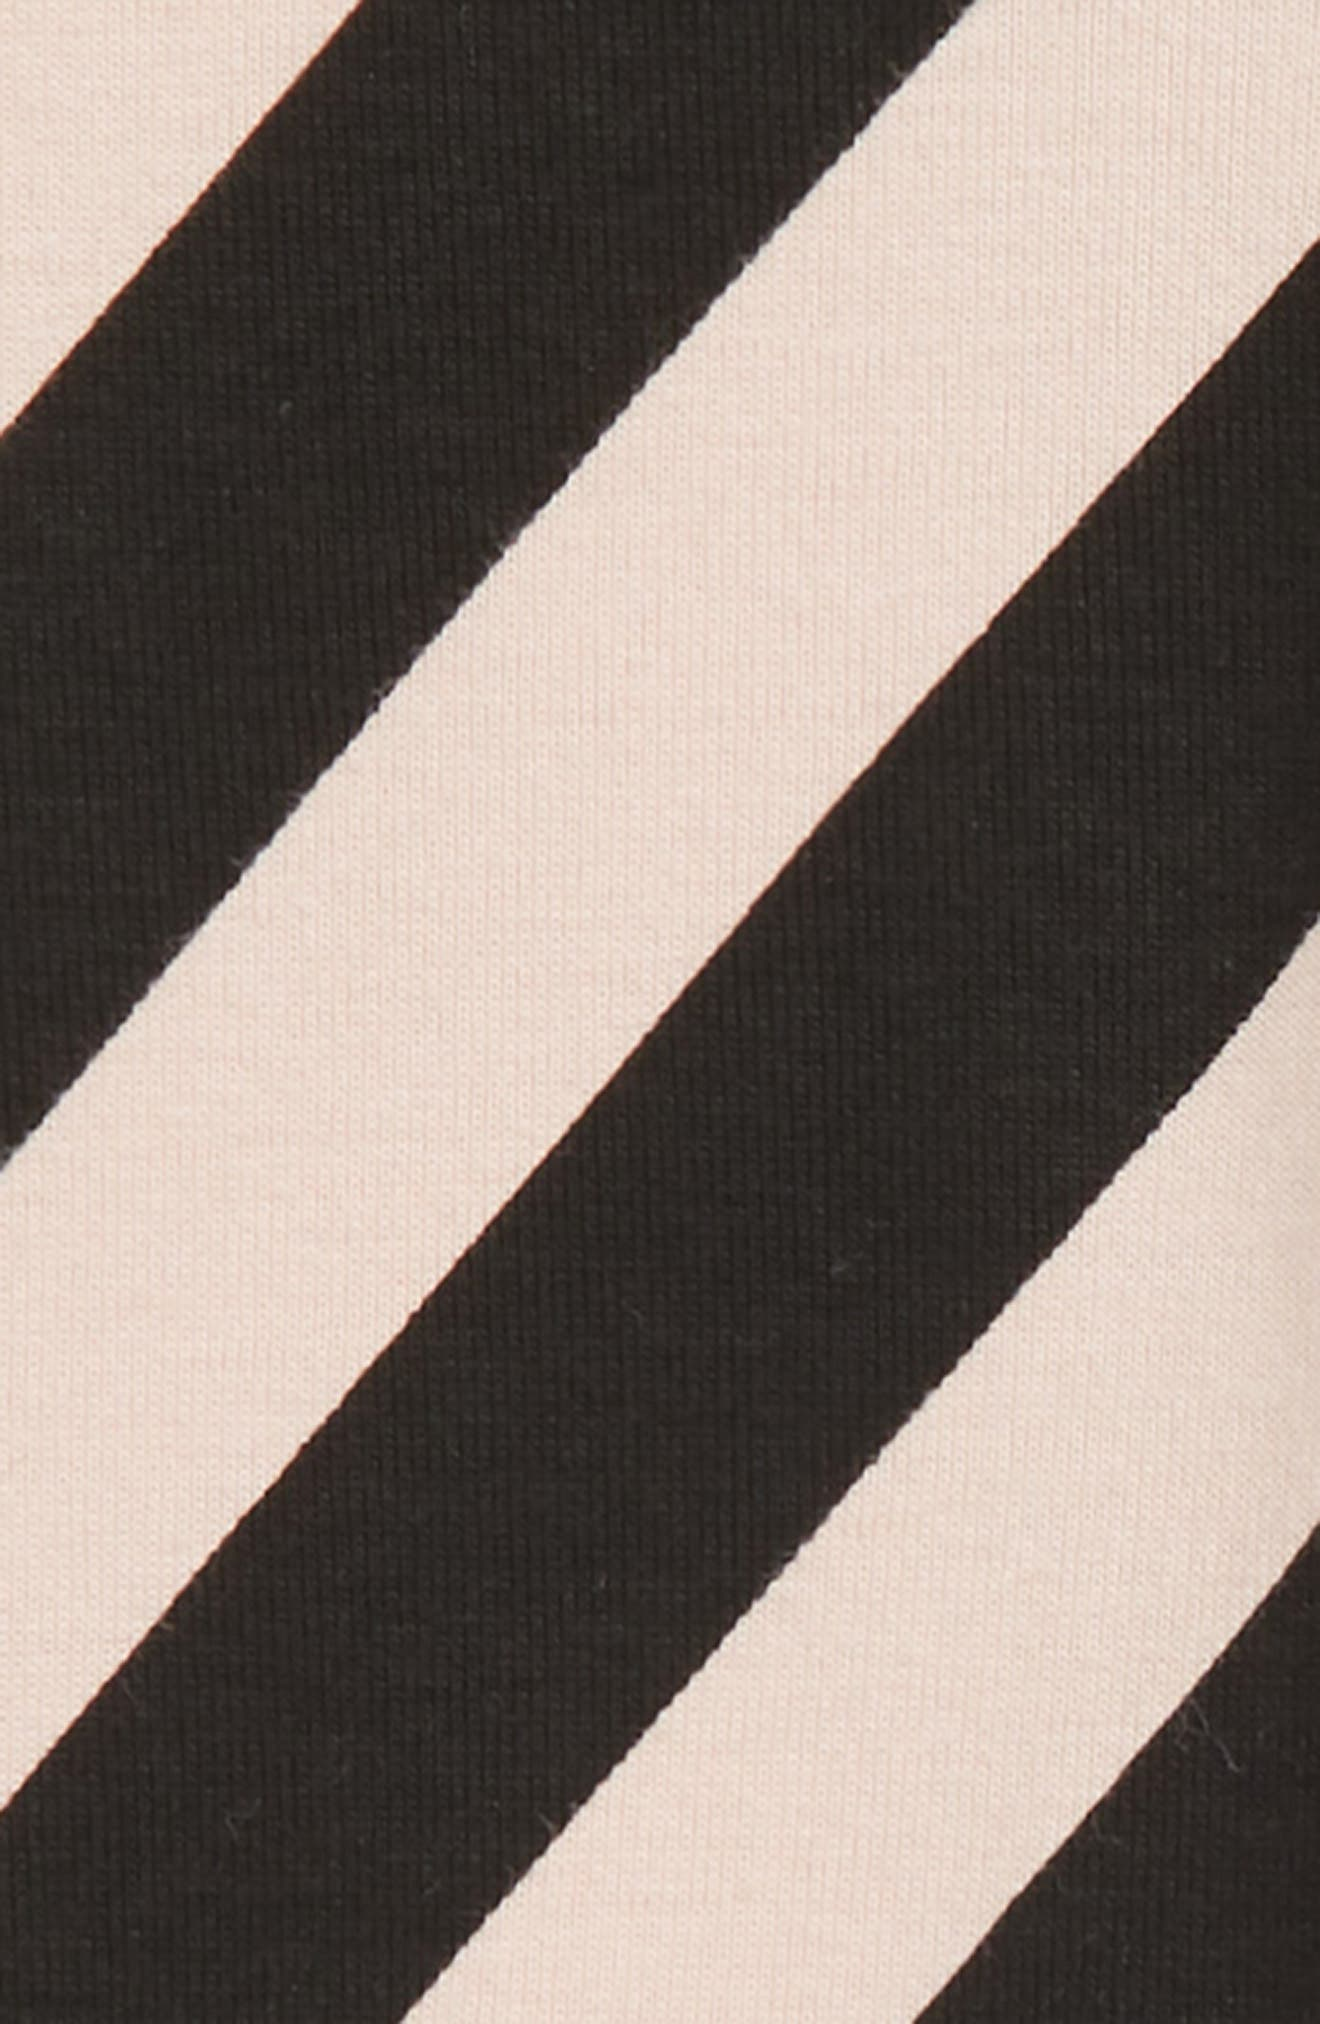 Striped Leggings,                             Alternate thumbnail 2, color,                             680